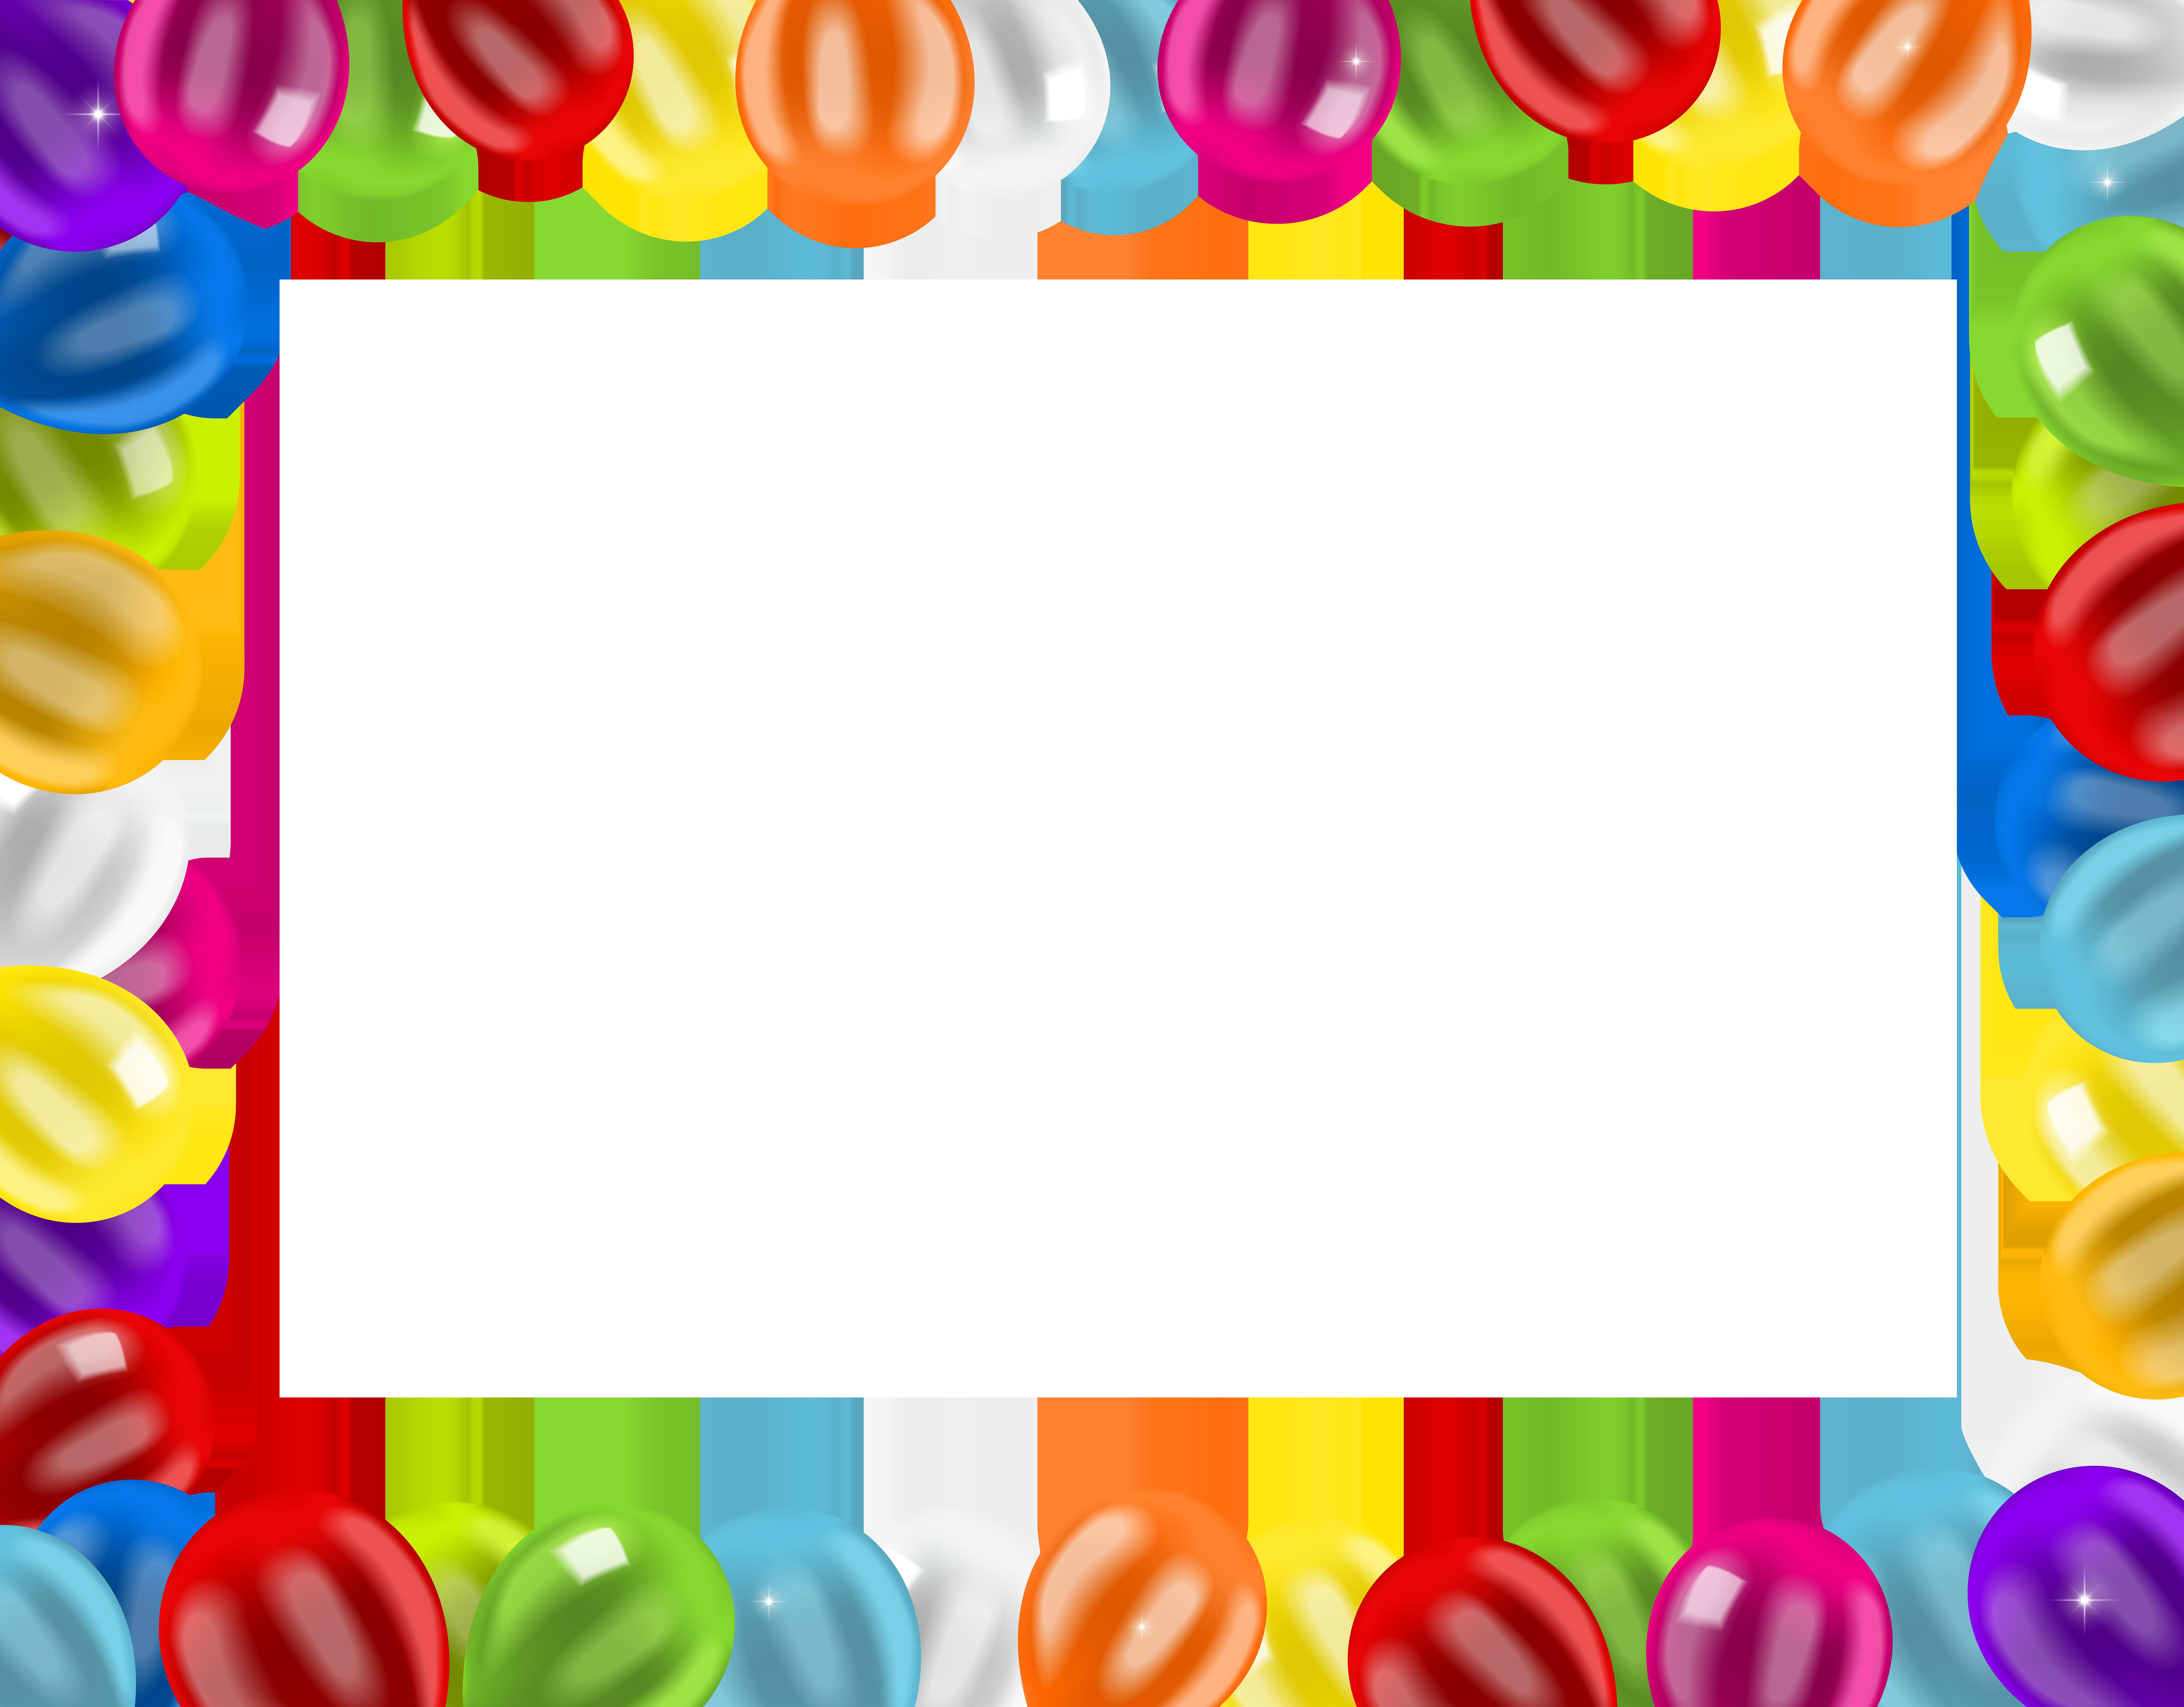 Balloon clip art border. Donut clipart frame